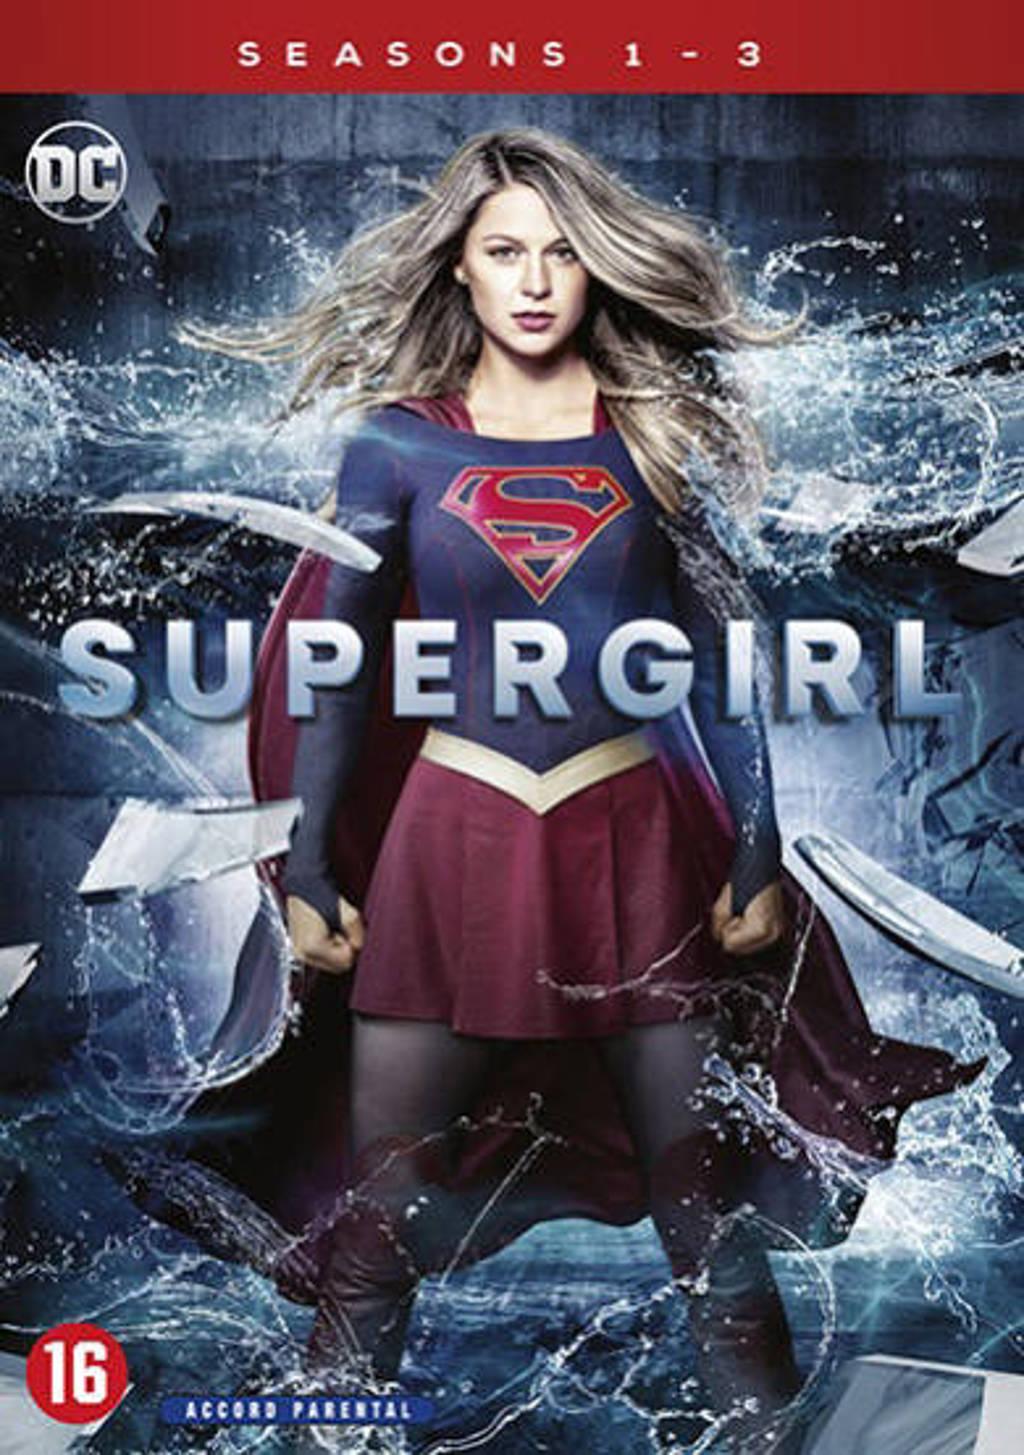 Supergirl - Seizoen 1-3 (DVD)